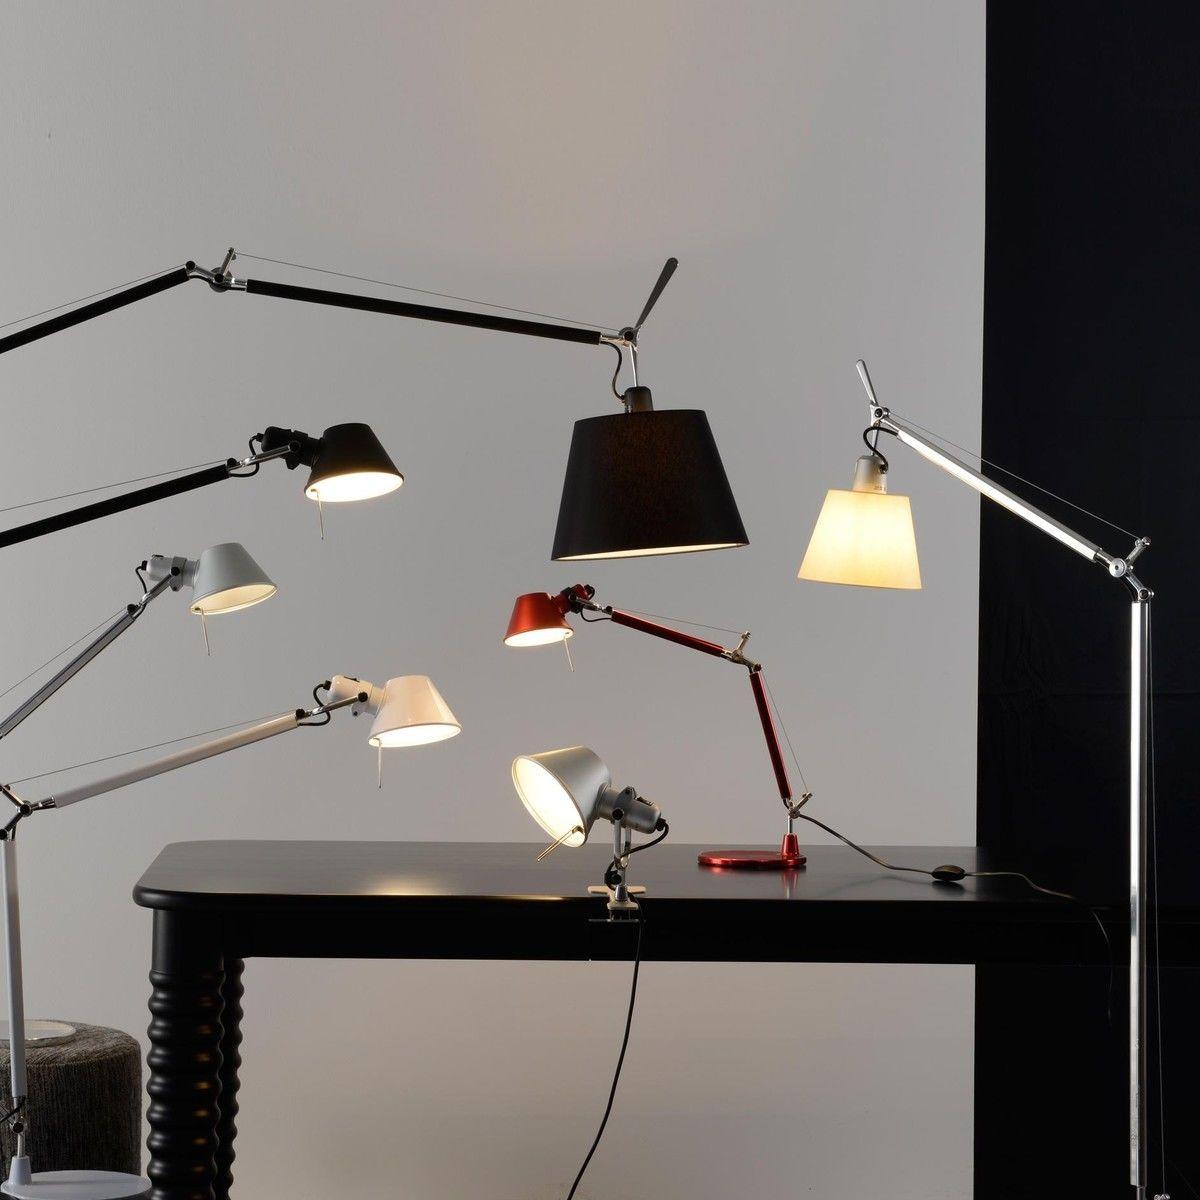 tolomeo micro tavolo tischleuchte artemide. Black Bedroom Furniture Sets. Home Design Ideas